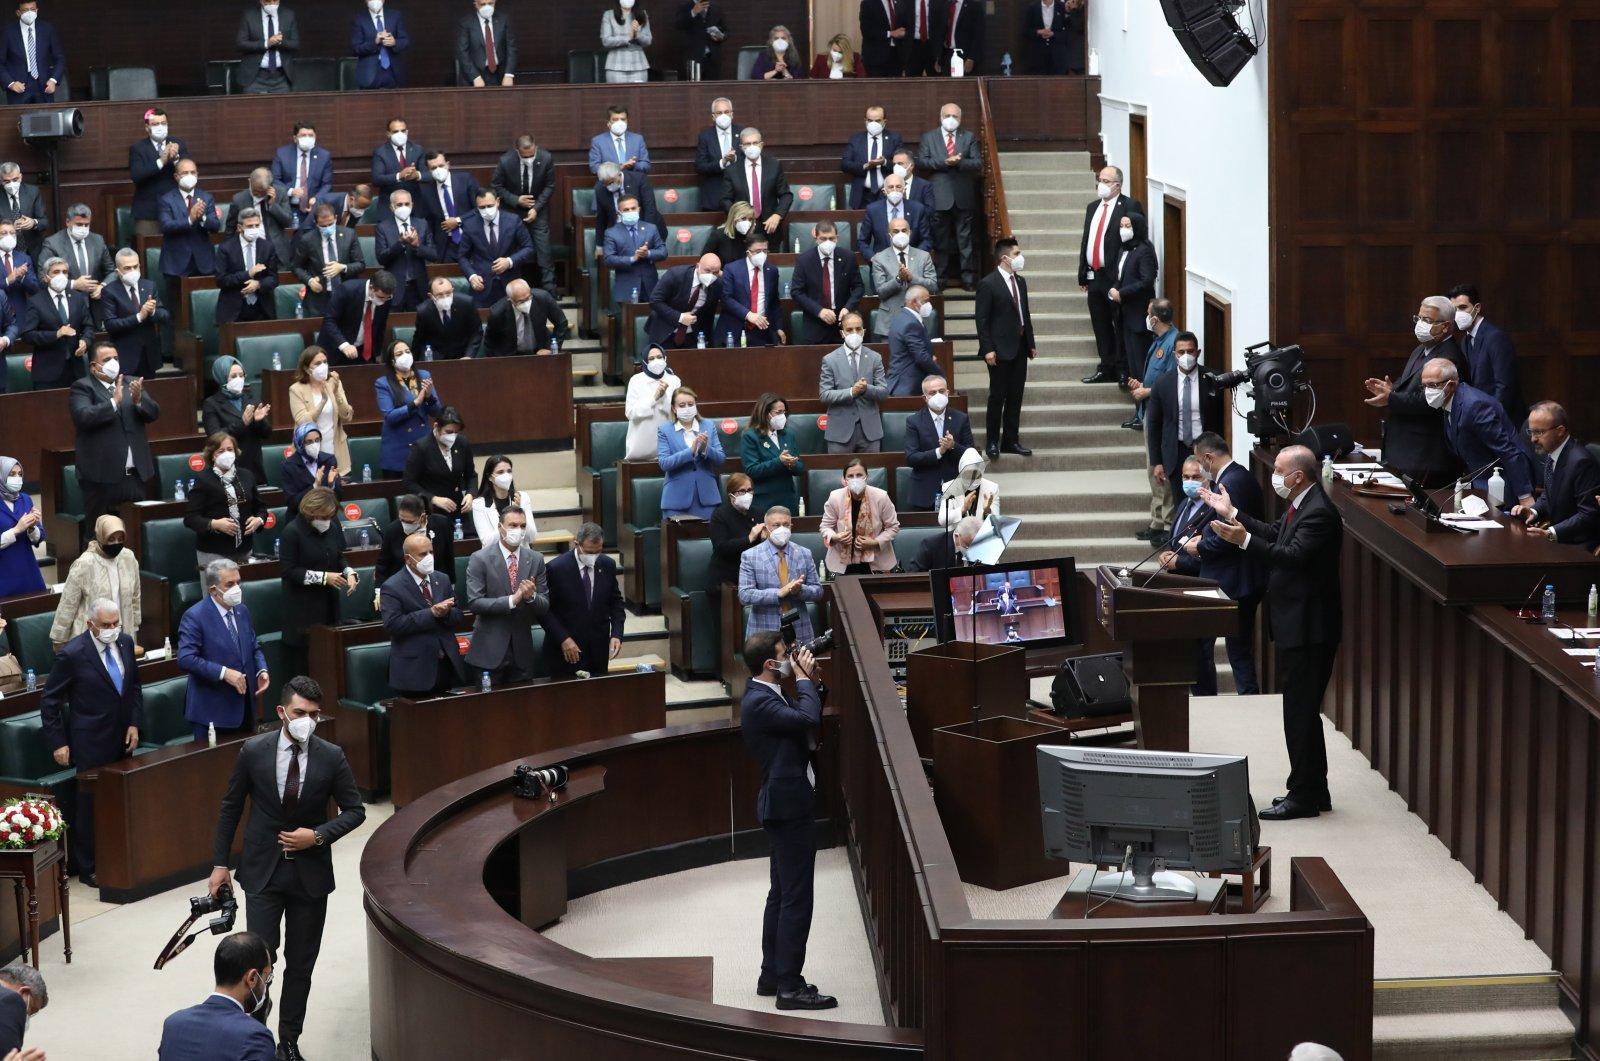 President Recep Tayyip Erdoğan addresses members of the ruling Justice and Development Party (AK Party), Ankara, Turkey, June 9, 2021. (Photo by Ali Ekeyılmaz)